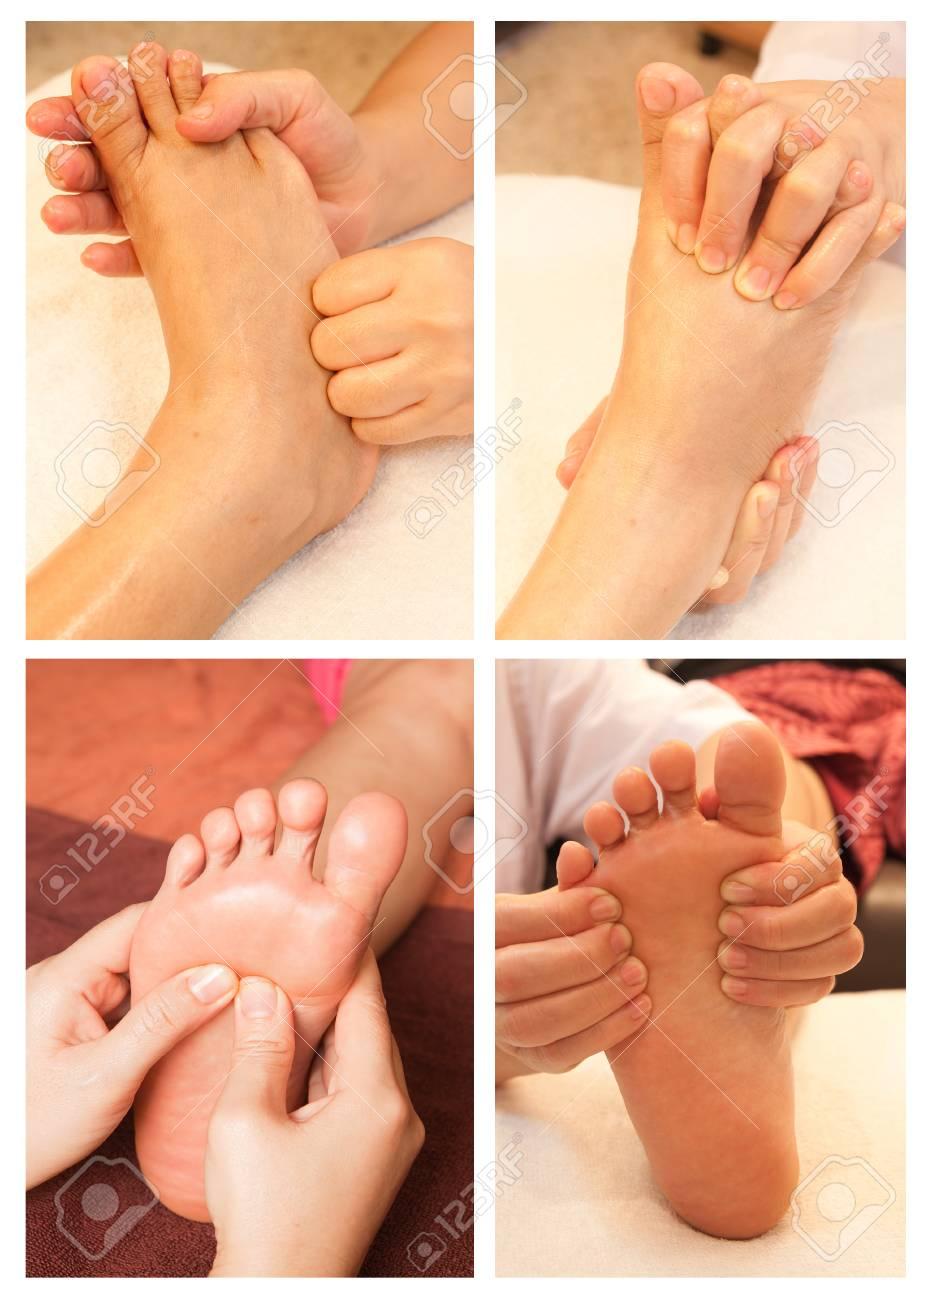 Collection of reflexology foot massage Stock Photo - 26420376